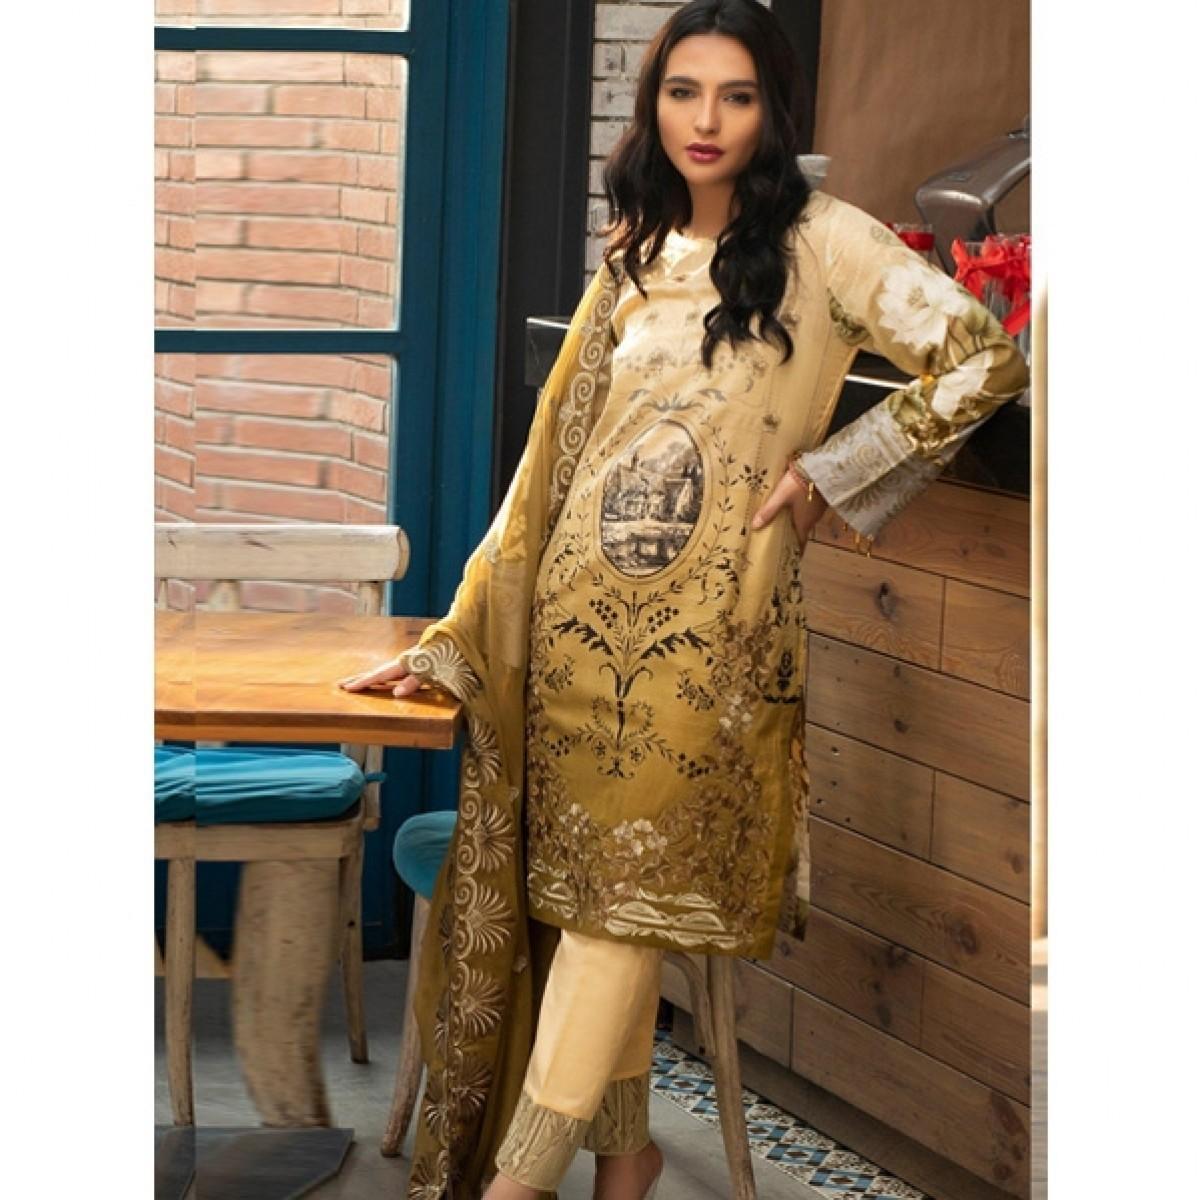 685d2e0014 Salitex Shades Summer 2019 3 Piece Price in Pakistan | Buy Salitex Shades Summer  Collection 2019 (WK-263B) | iShopping.pk